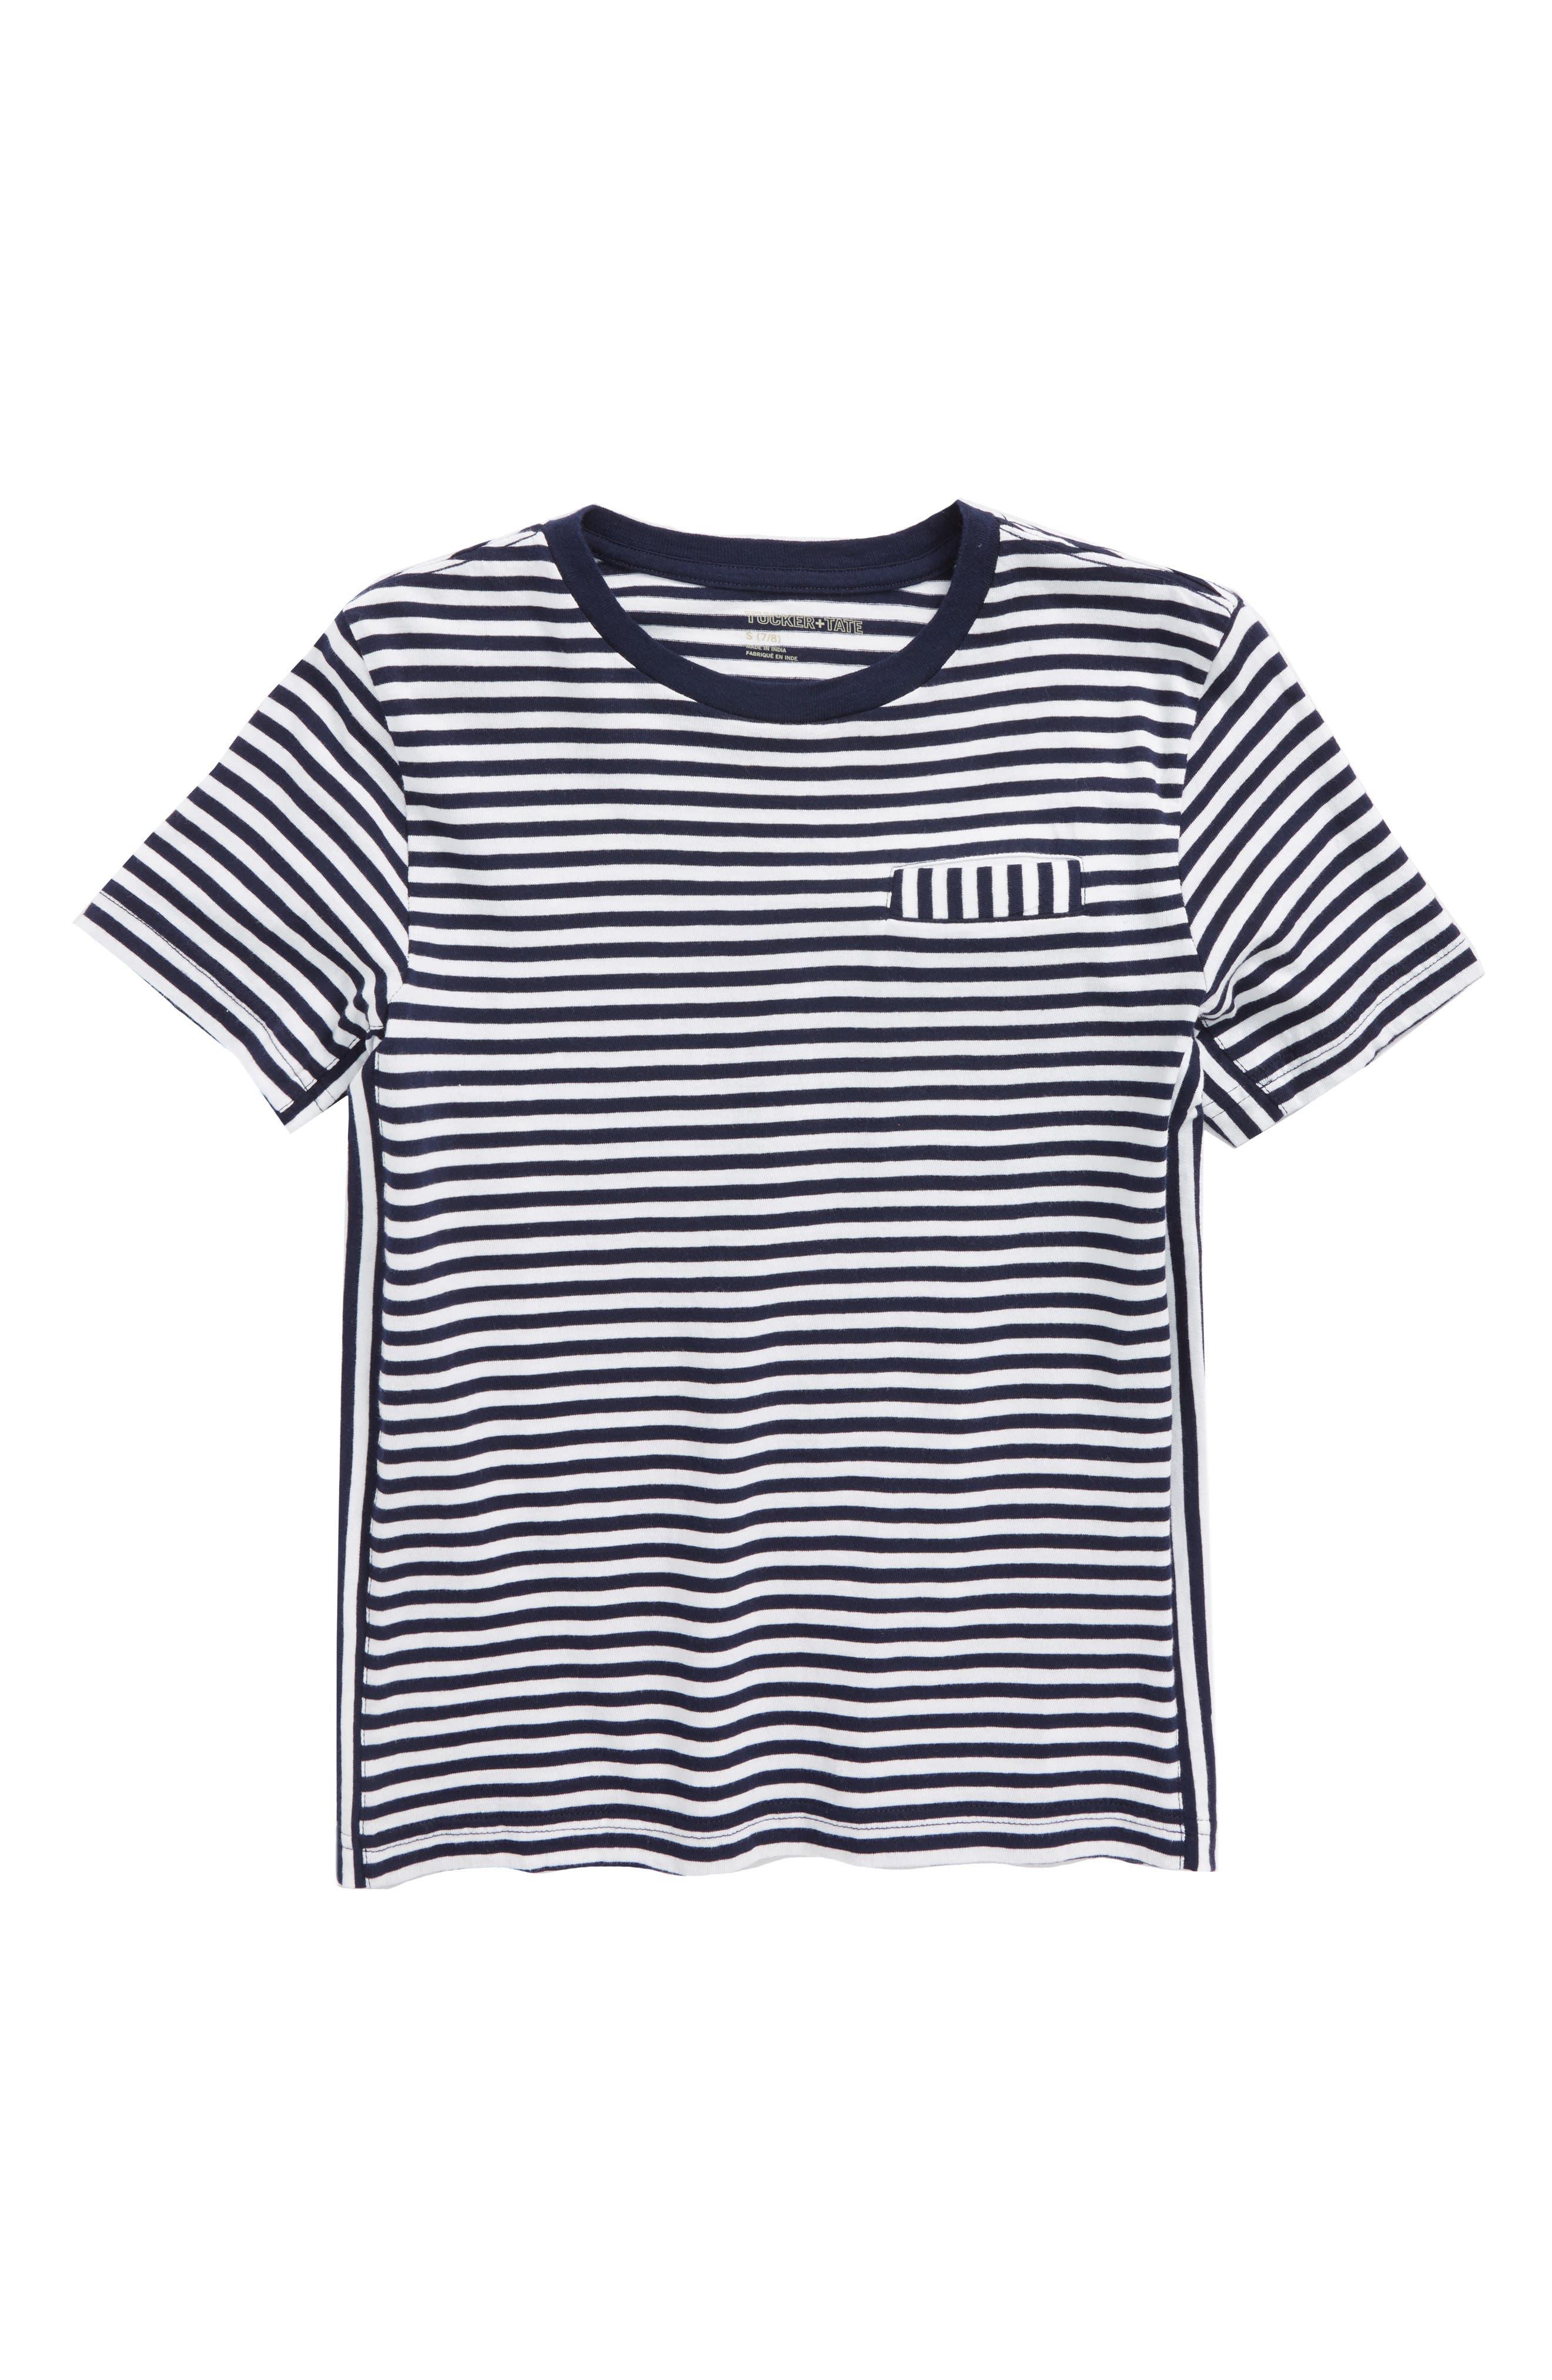 Stripe Pocket T-Shirt,                             Main thumbnail 1, color,                             Navy Denim- White Stripe